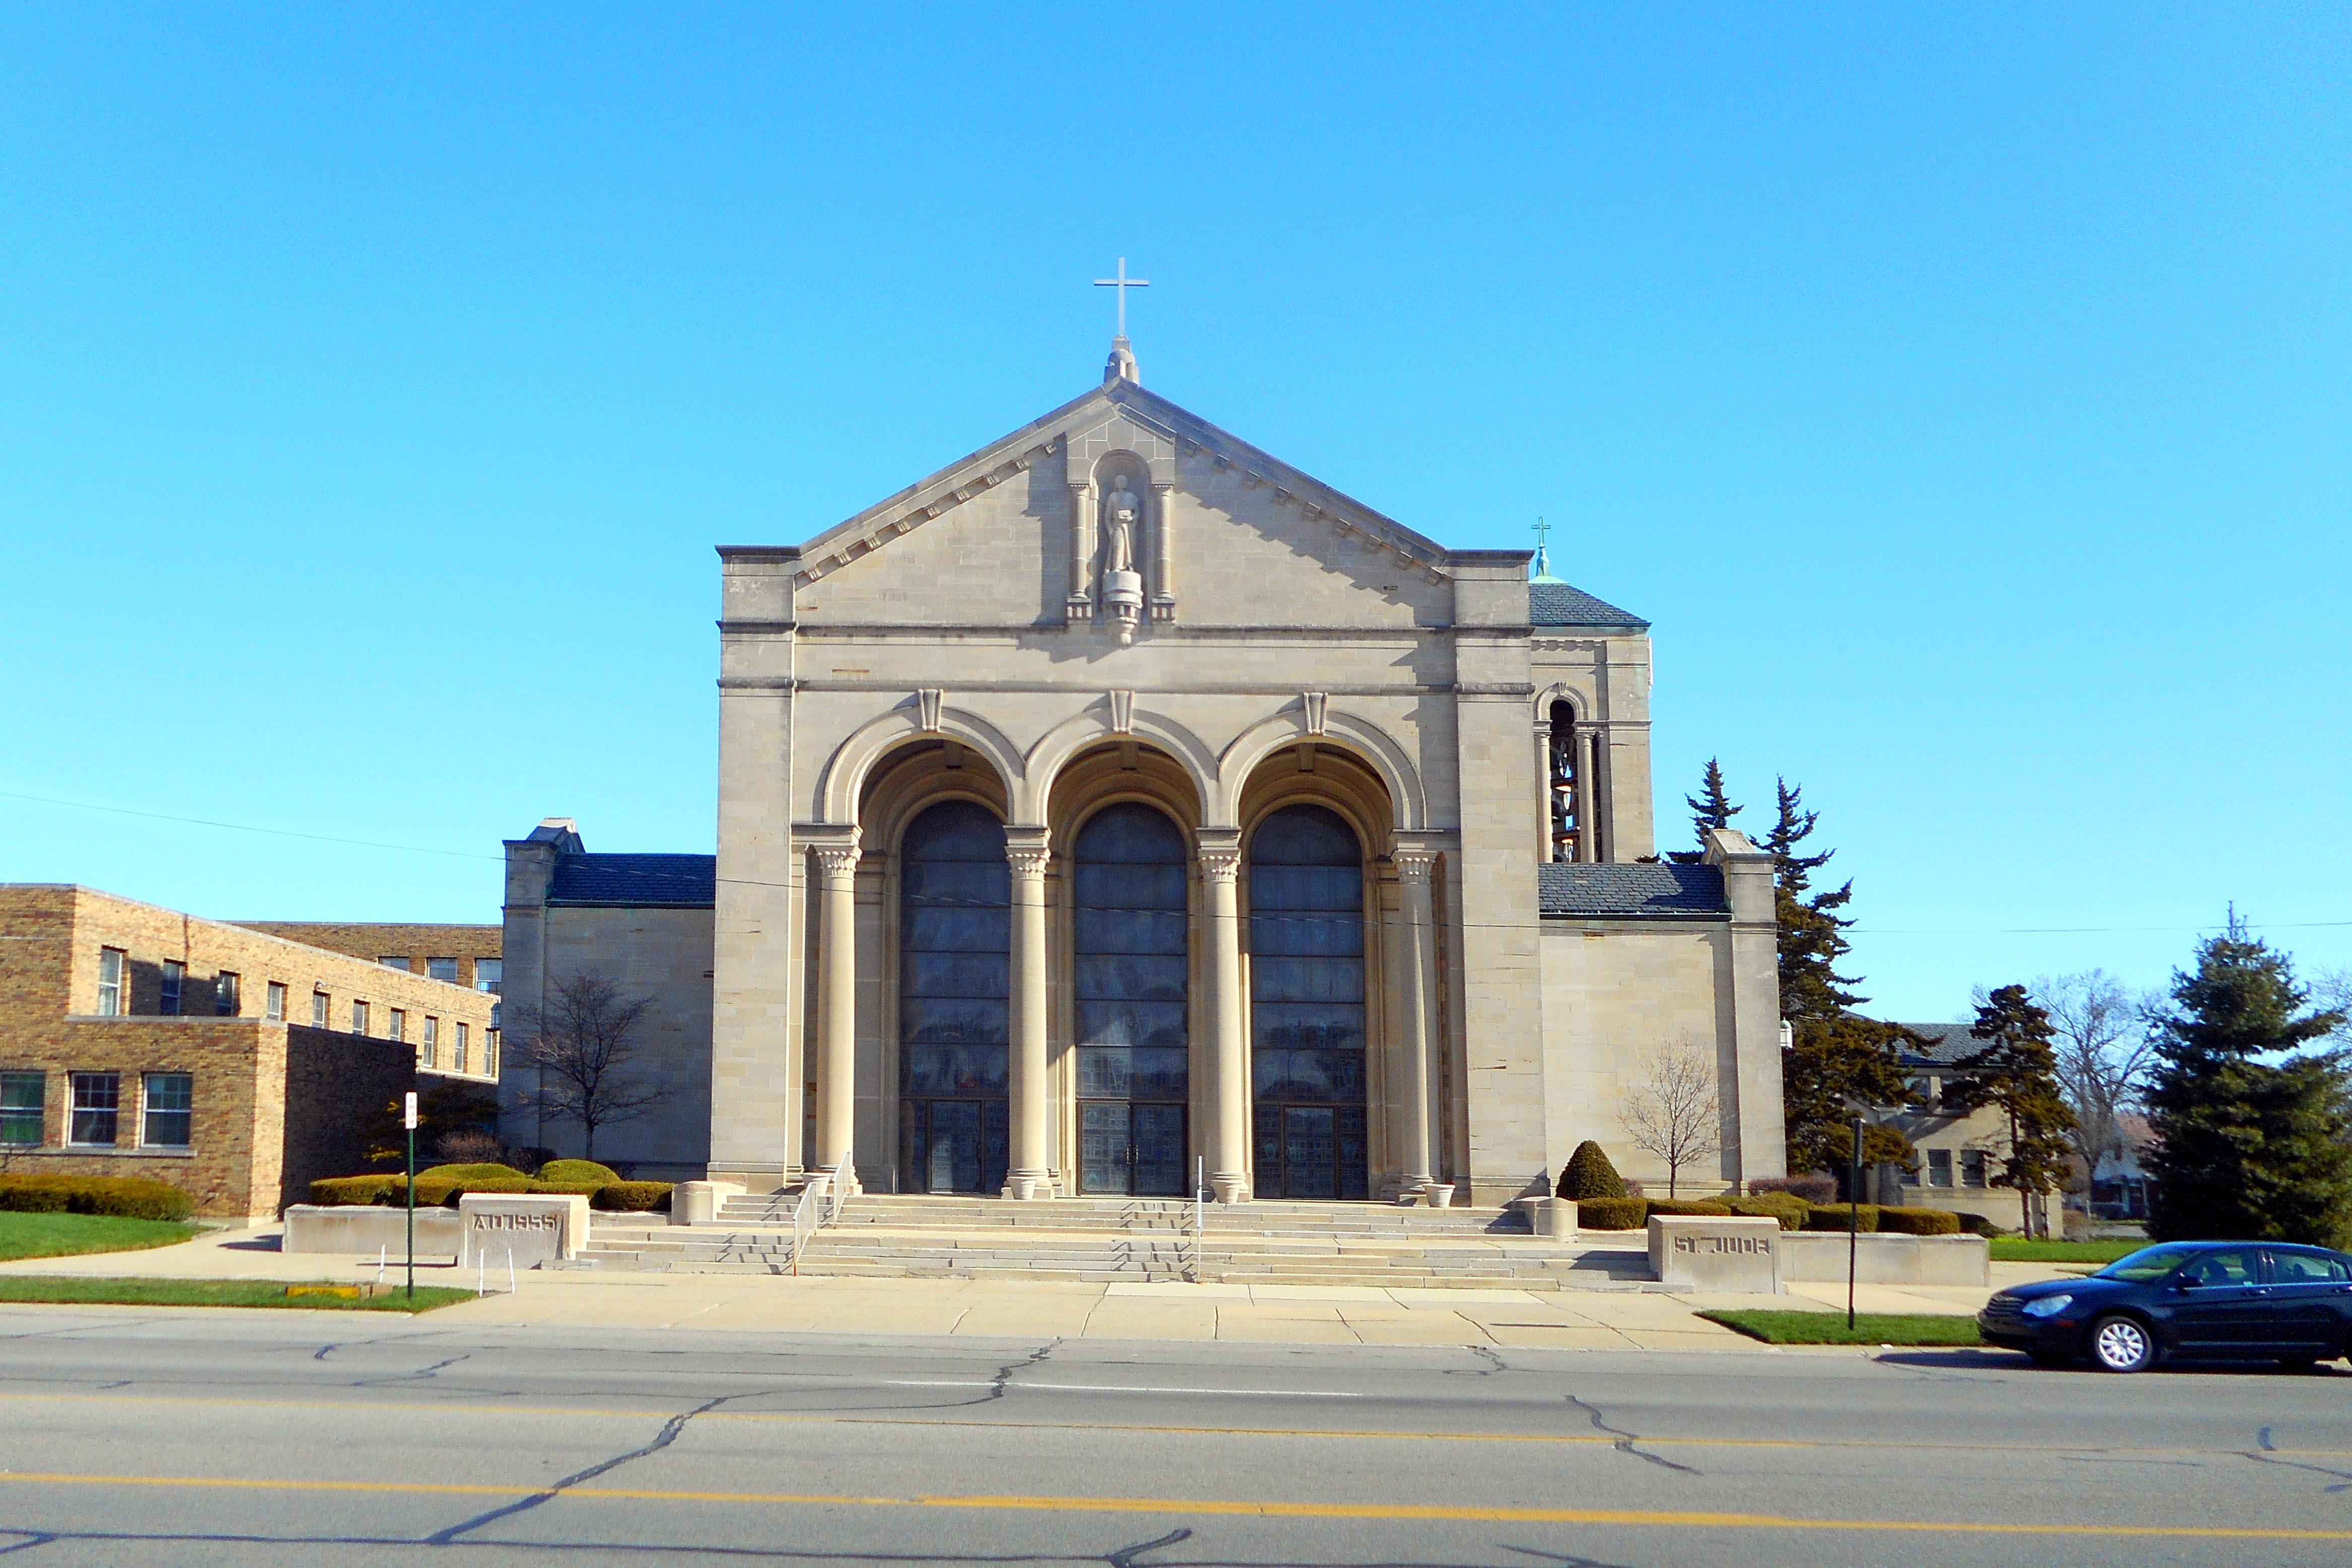 St Jude, Detroit, MI (Exterior)